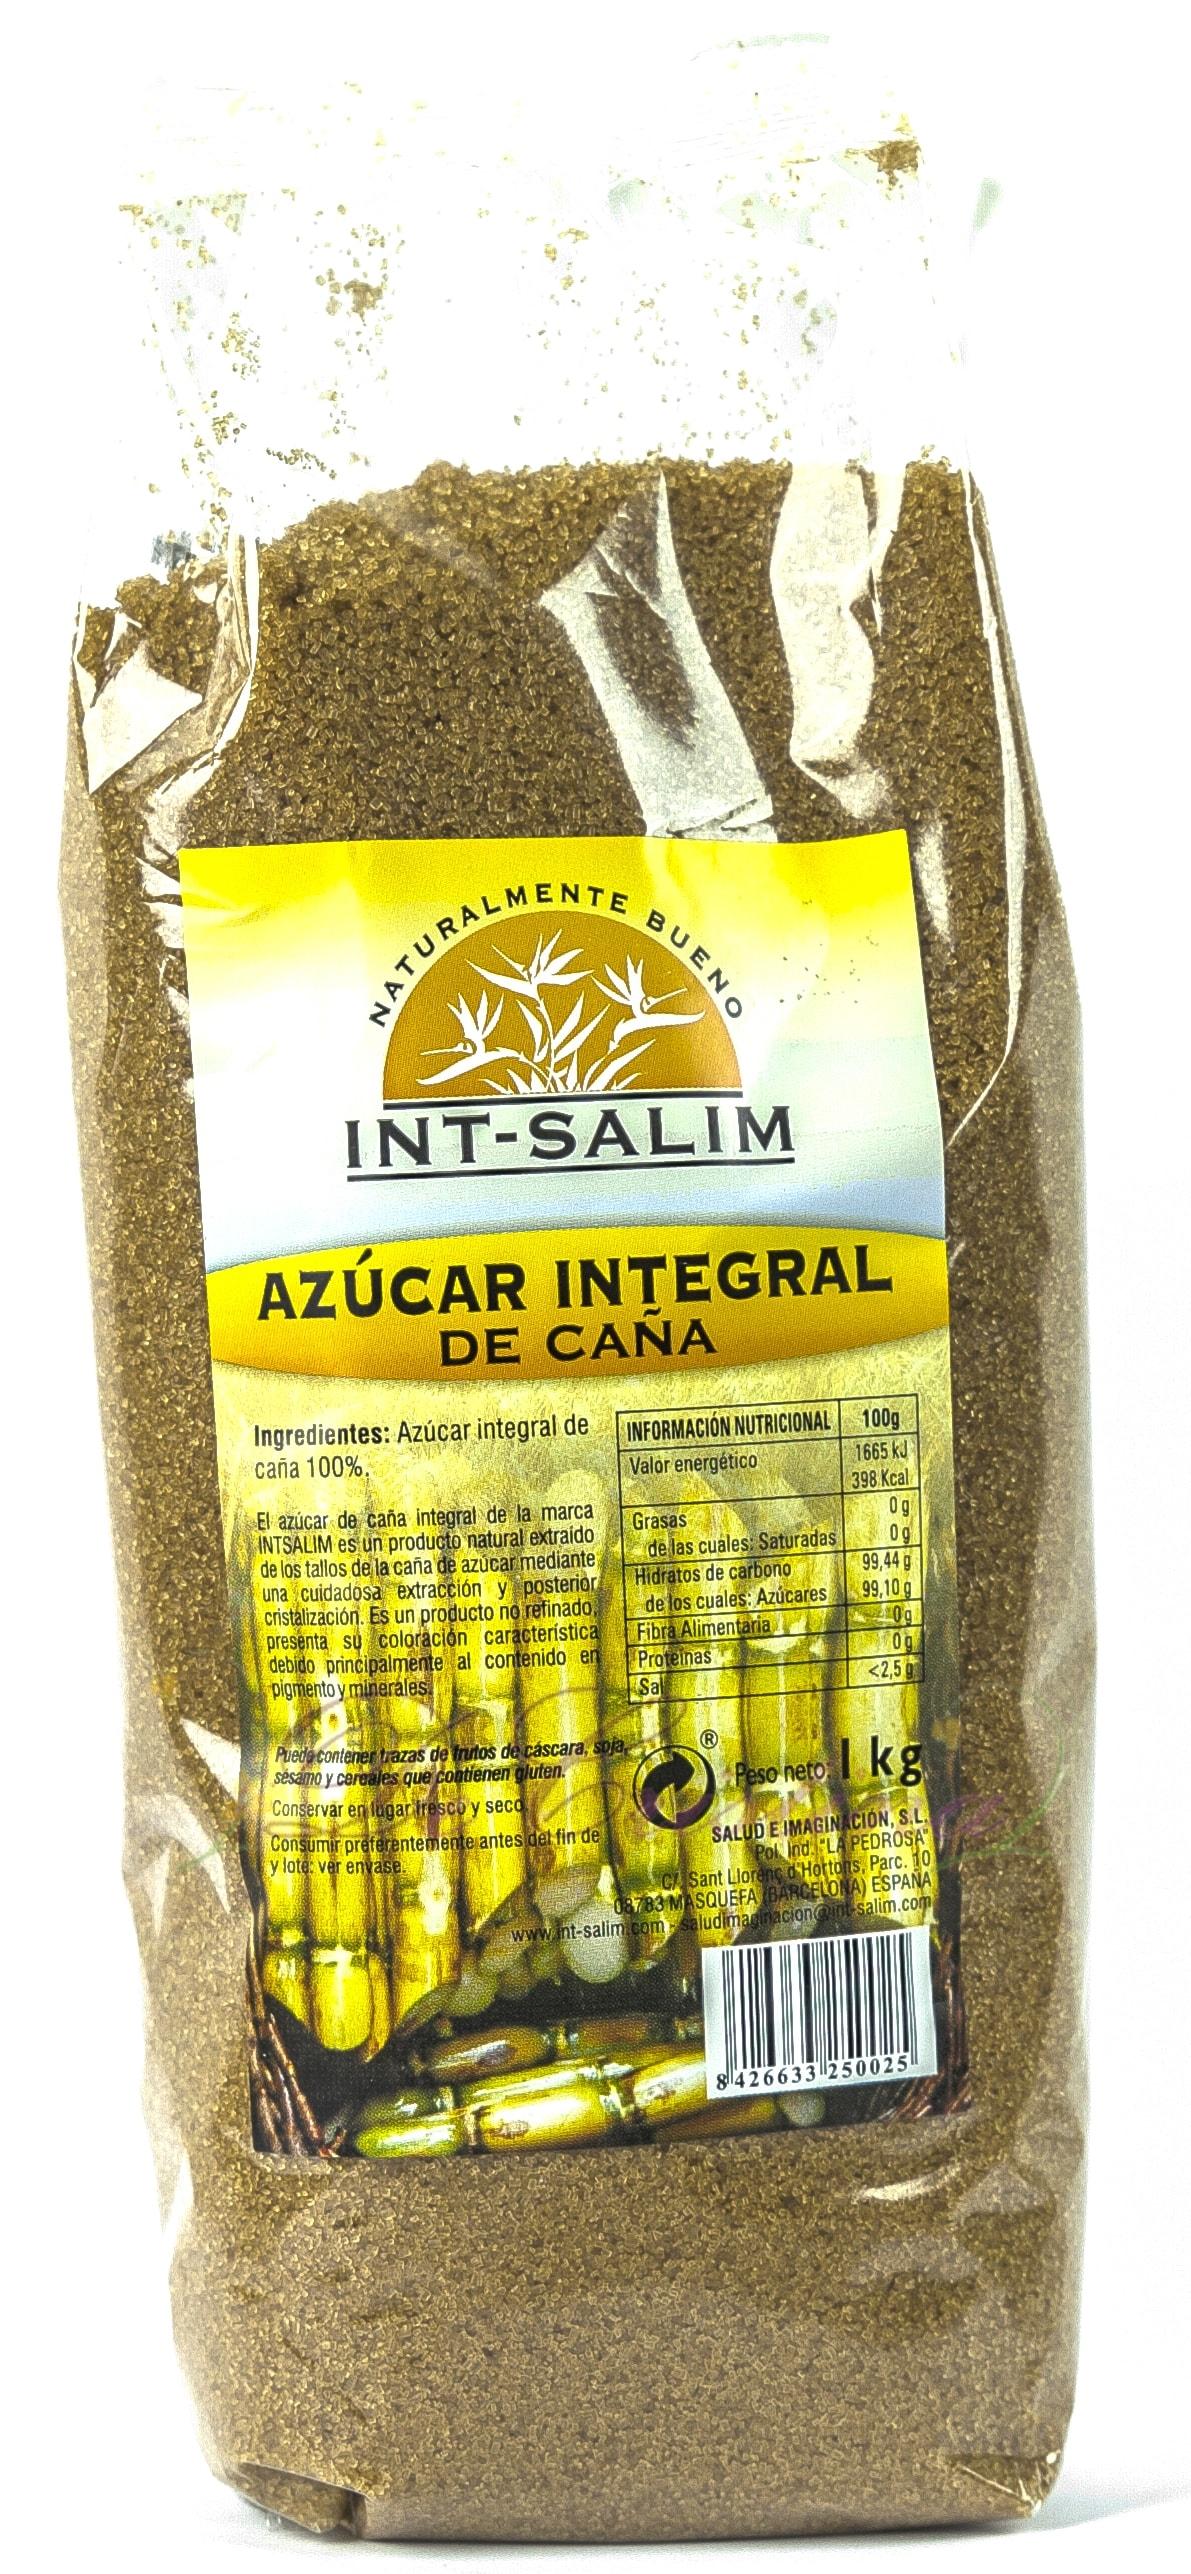 inst_salim_azucar_integral_cana.jpg